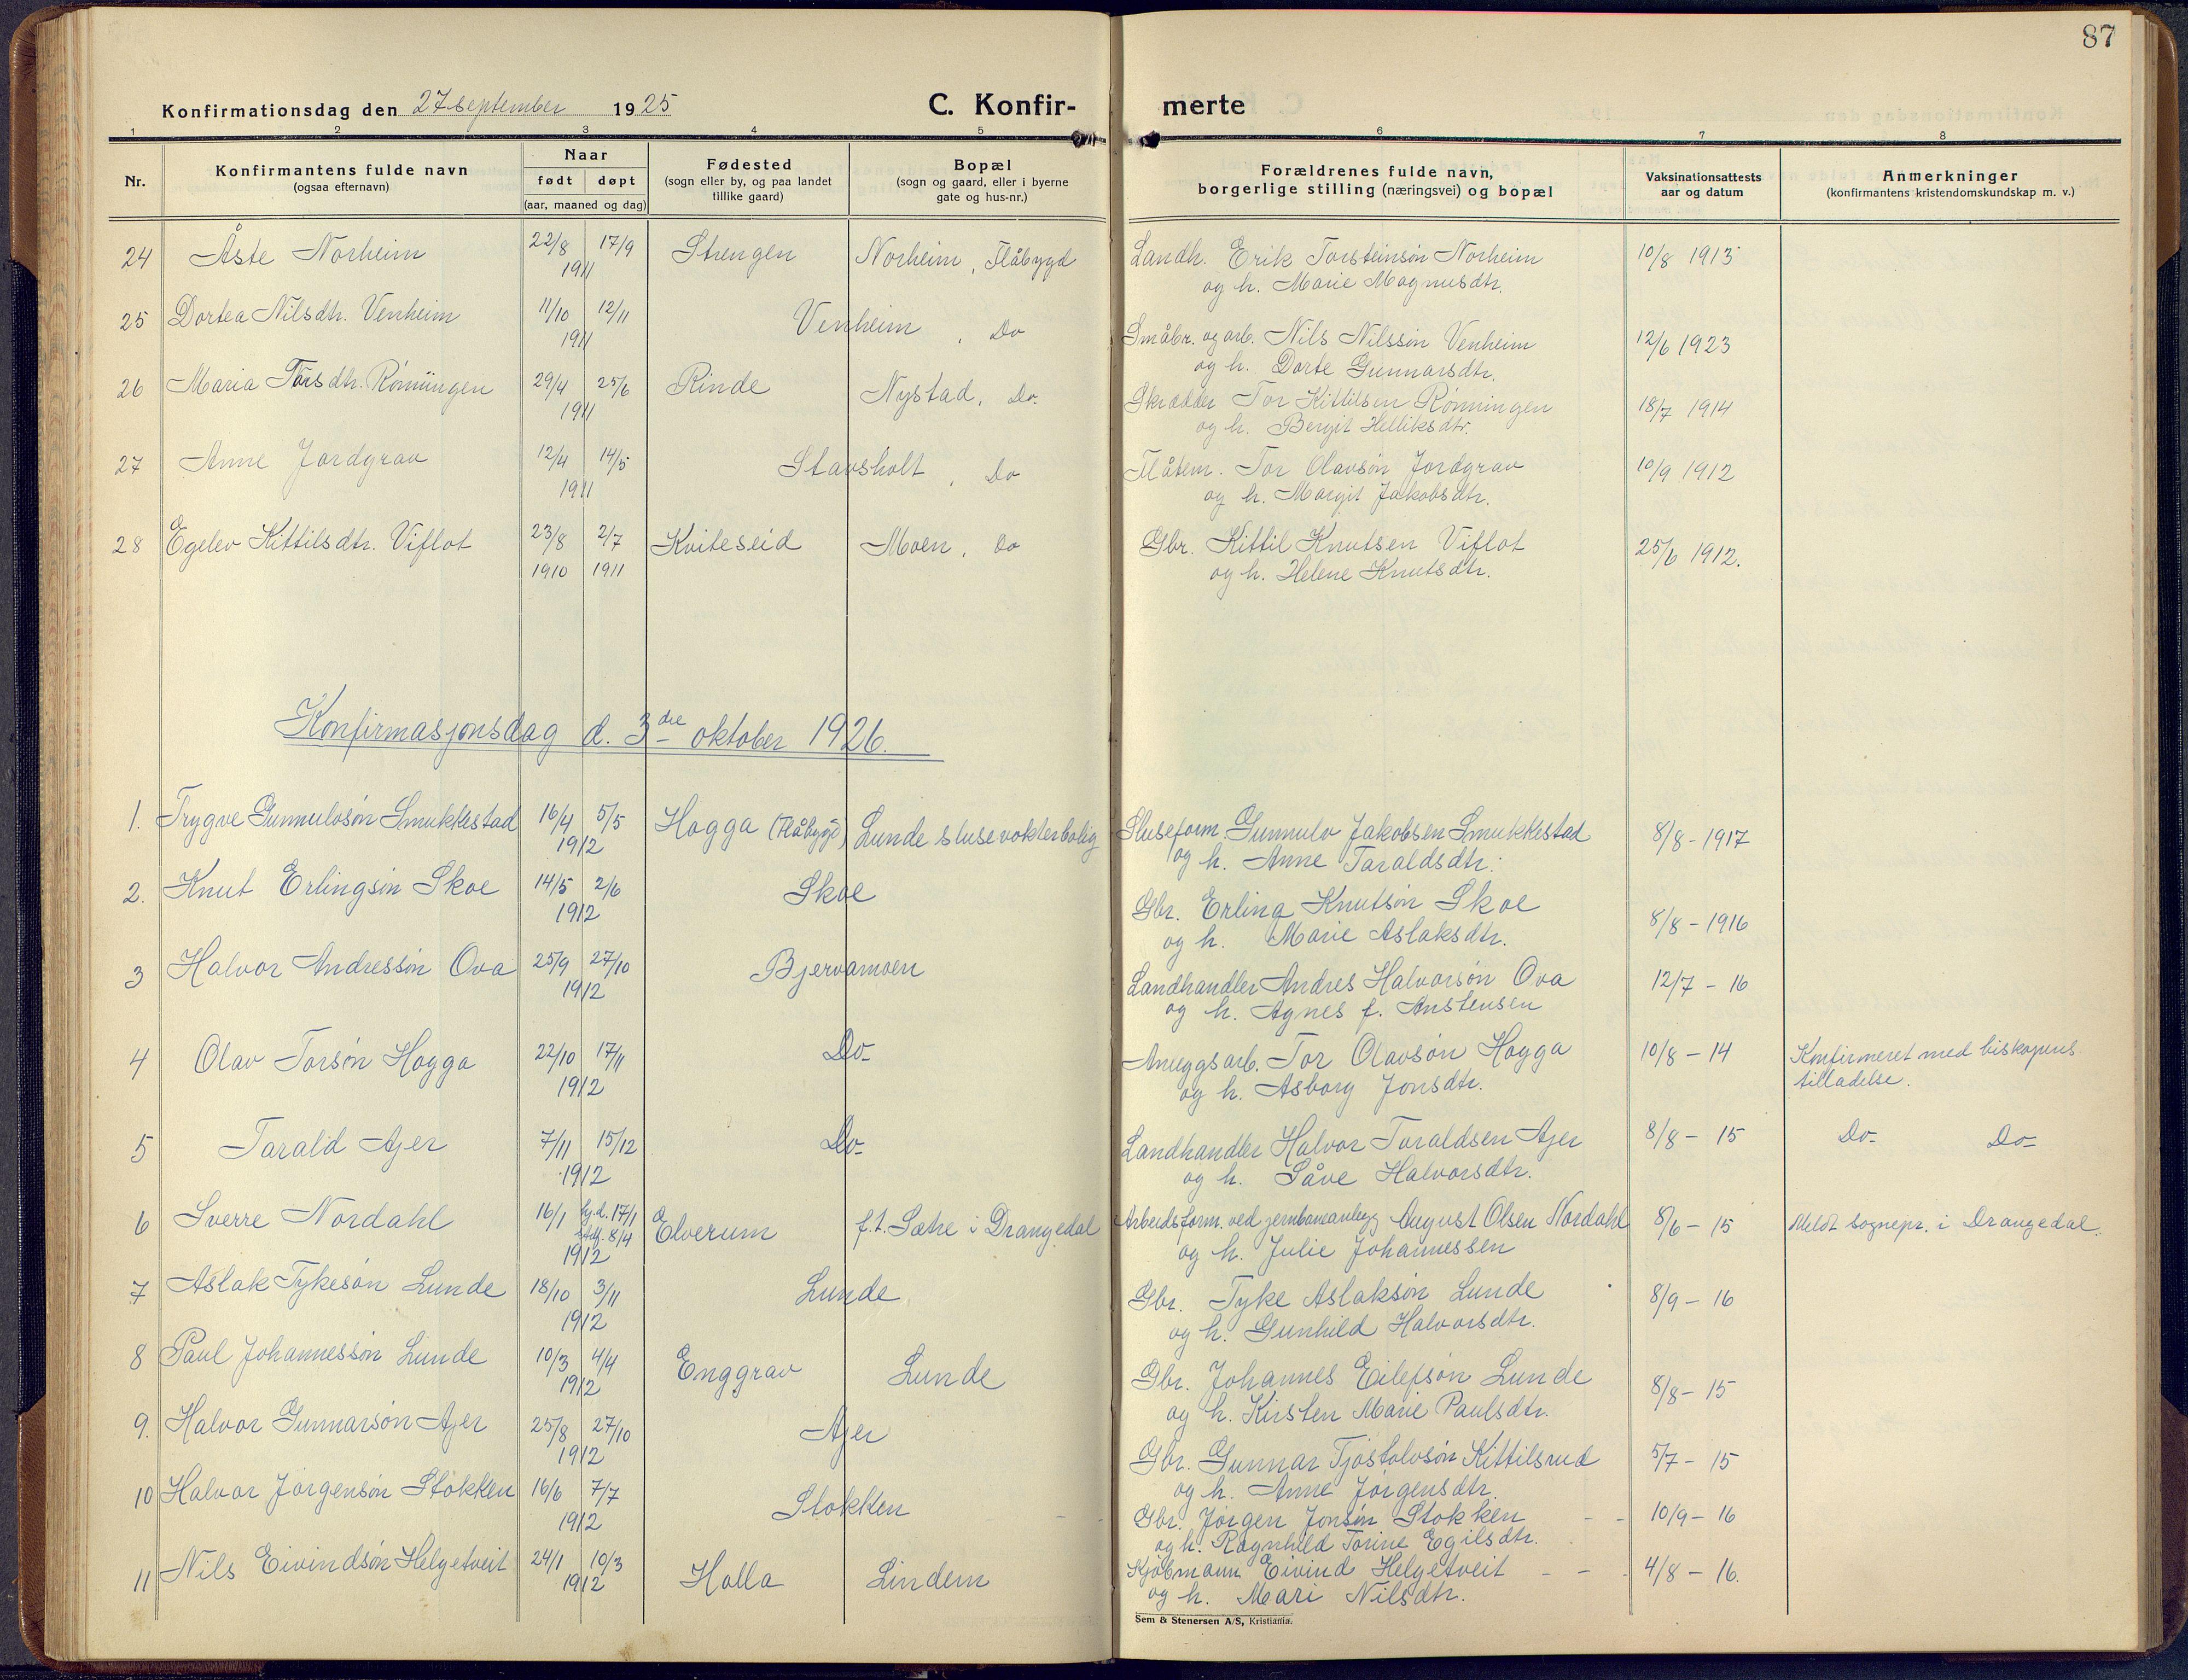 SAKO, Lunde kirkebøker, F/Fa/L0006: Ministerialbok nr. I 6, 1922-1940, s. 87